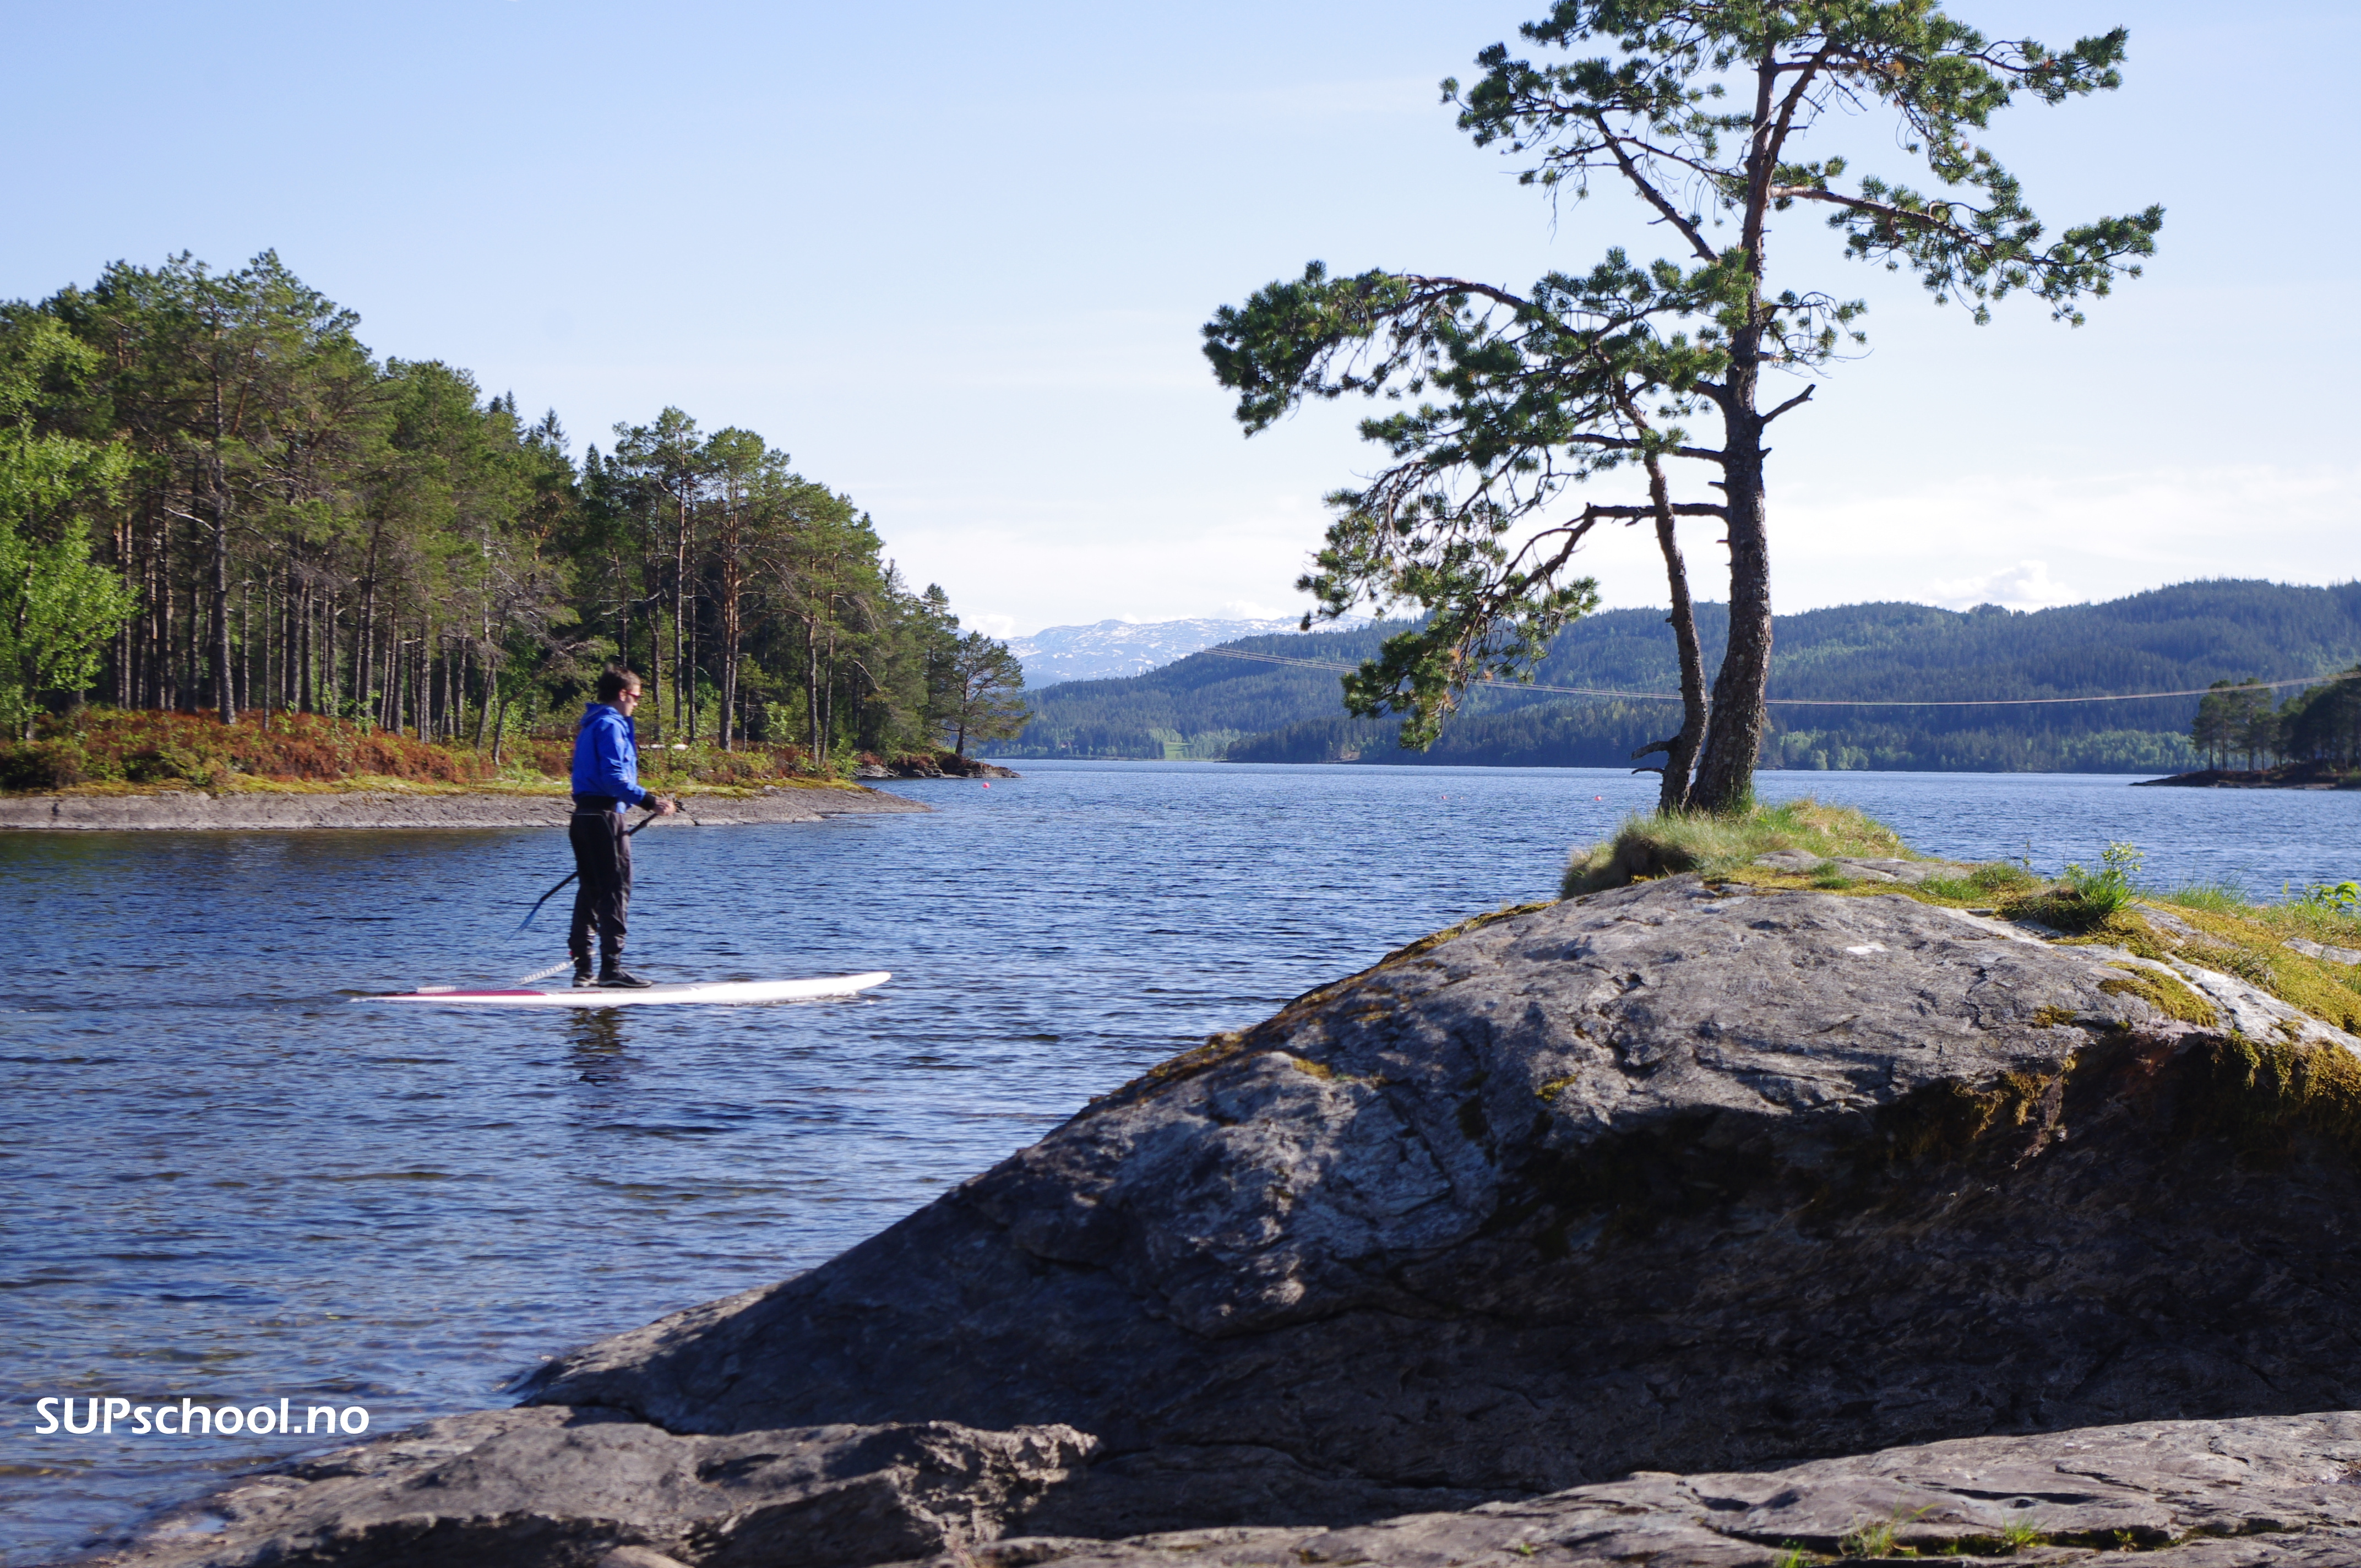 Discovering Ånøya